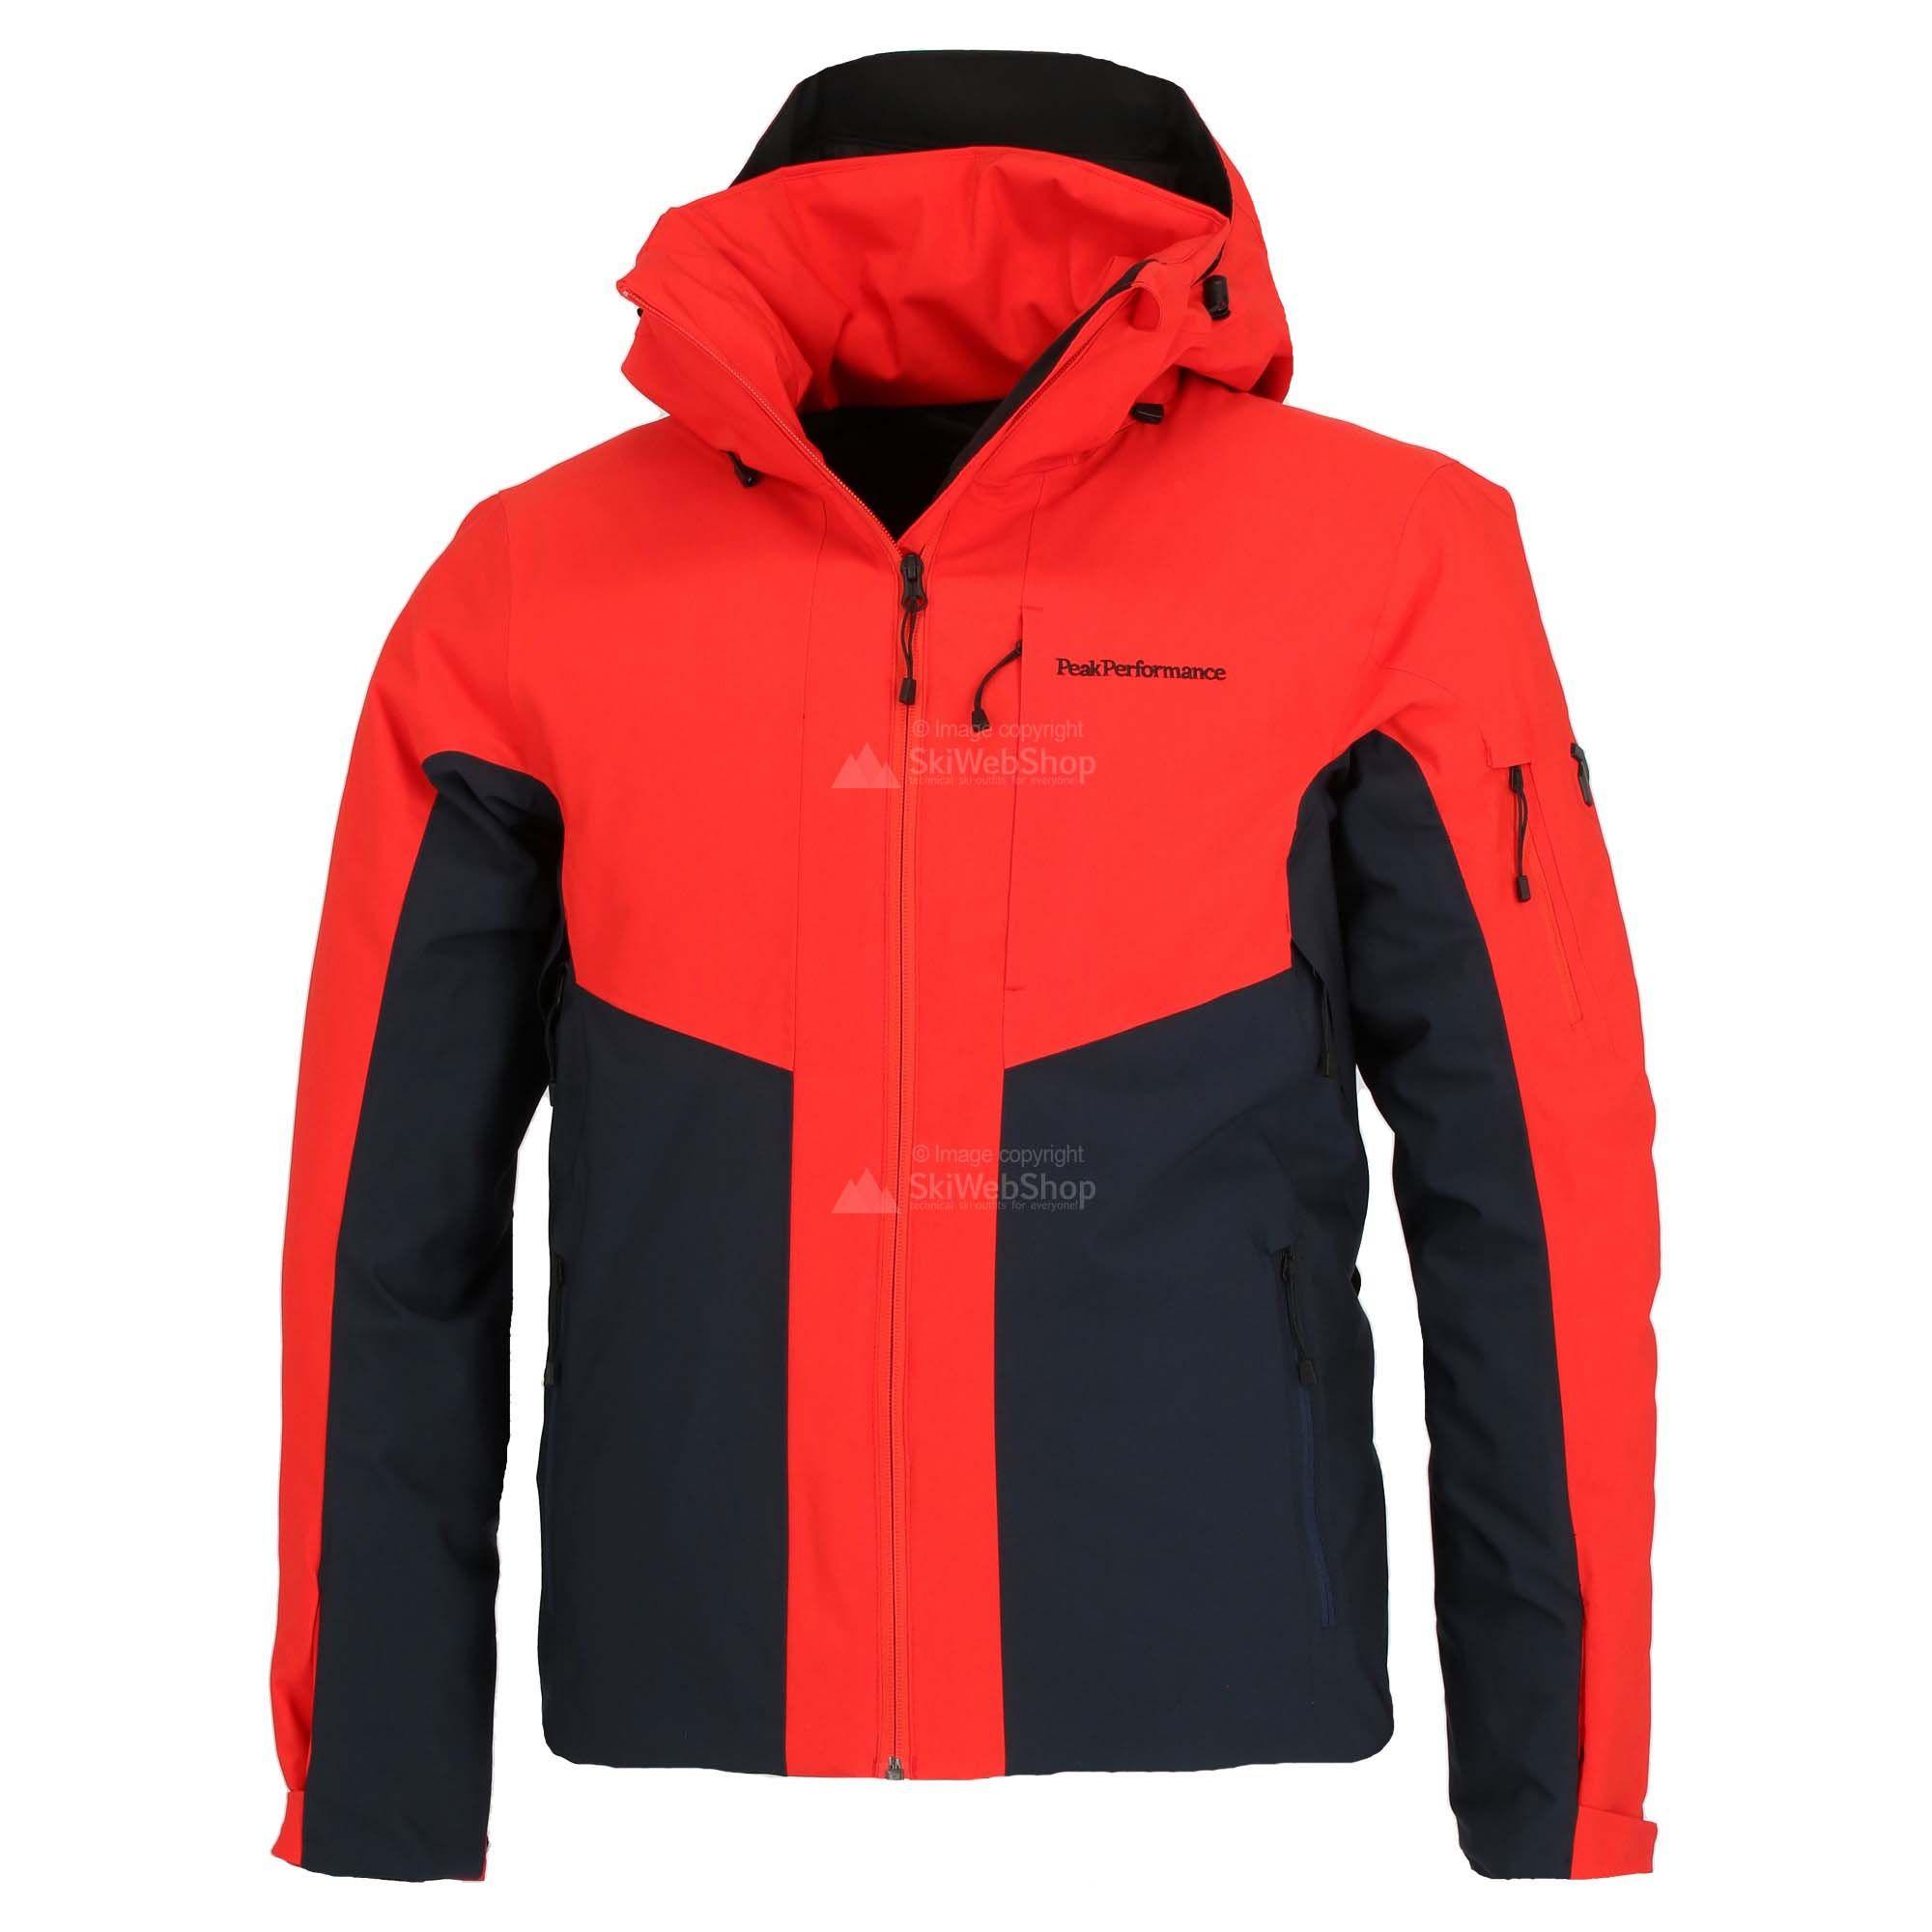 Peak Performance, Maroon, ski jas, heren, dyna rood • SkiWebShop